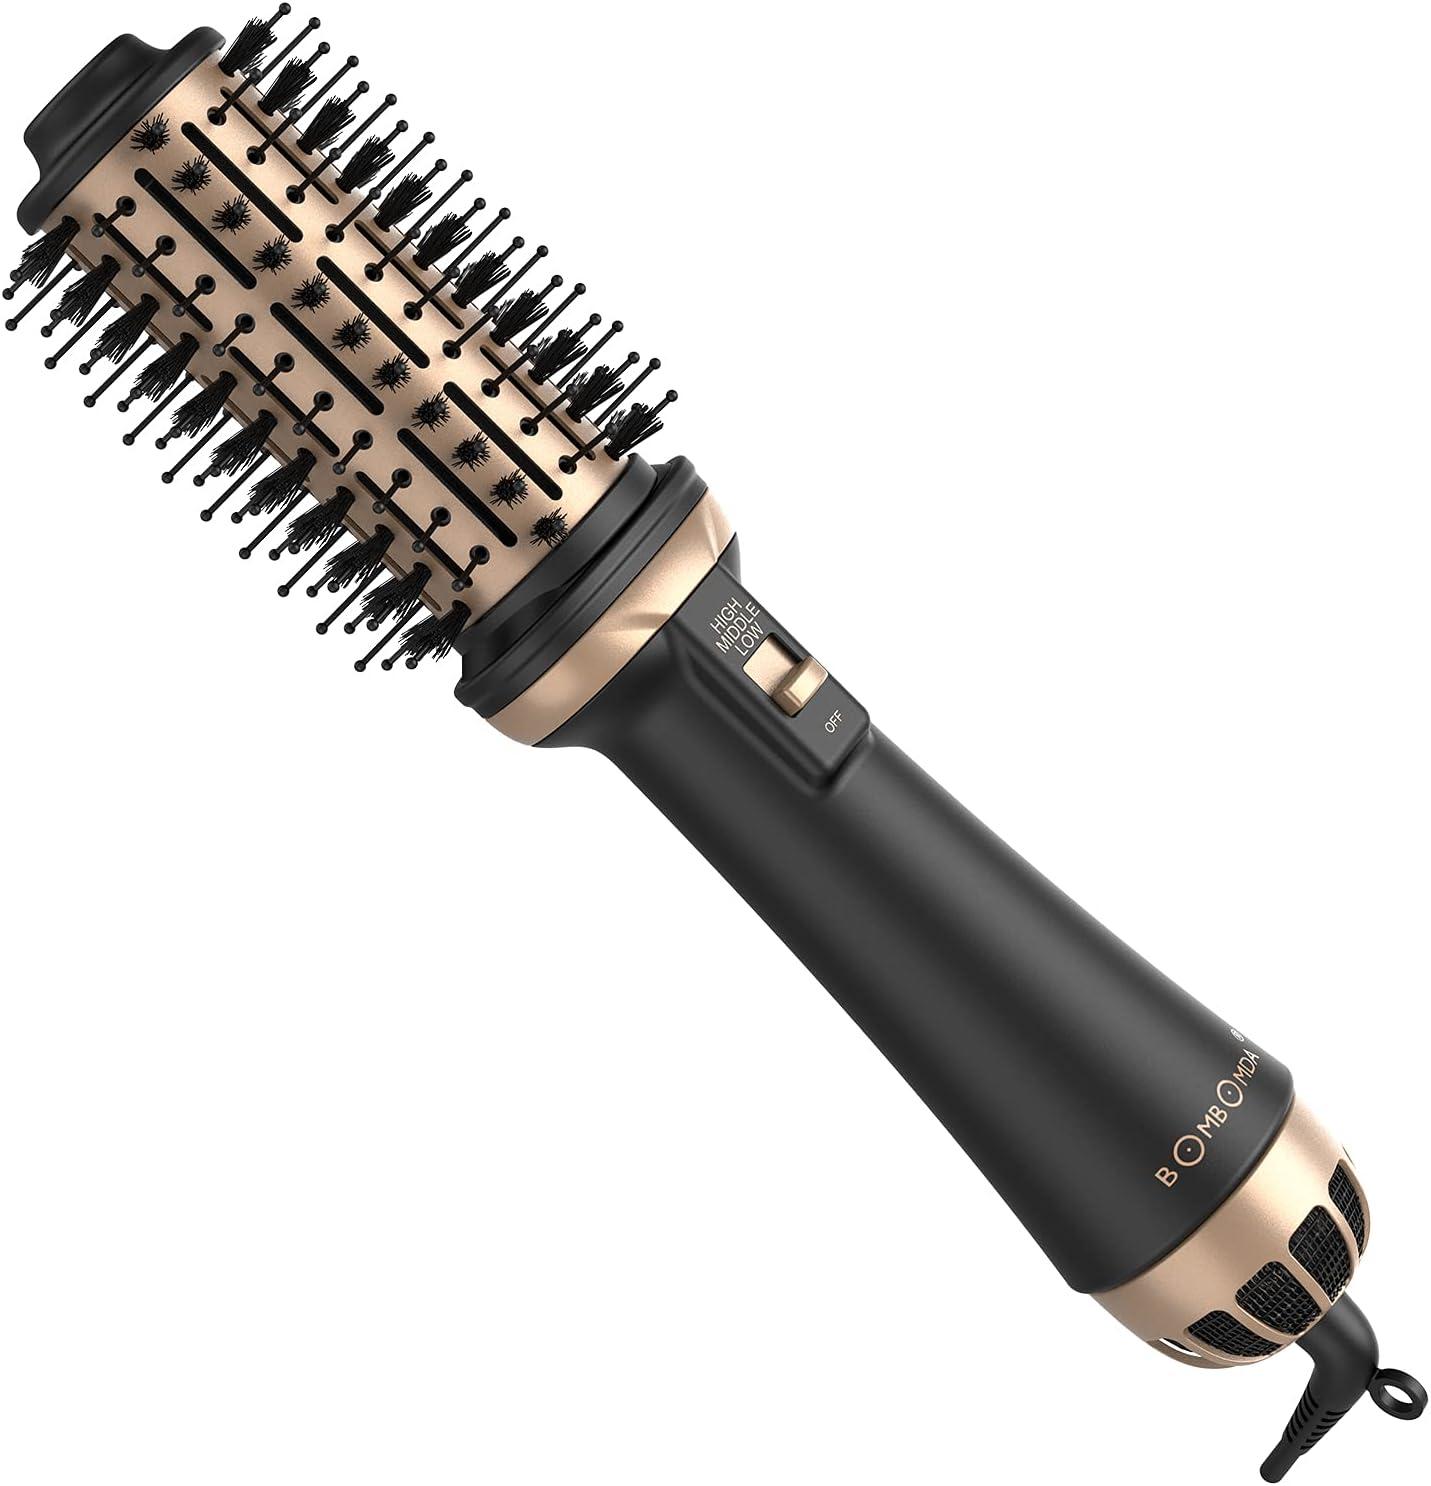 Cepillo de Aire Caliente, BOMBOMDA 4 en 1 Cepillo Secador de Pelo Secador Moldeador Rizador y Plancha, 3 modos, Multifunción Secador de con Iones Negativos para Peinado de Salón de Belleza